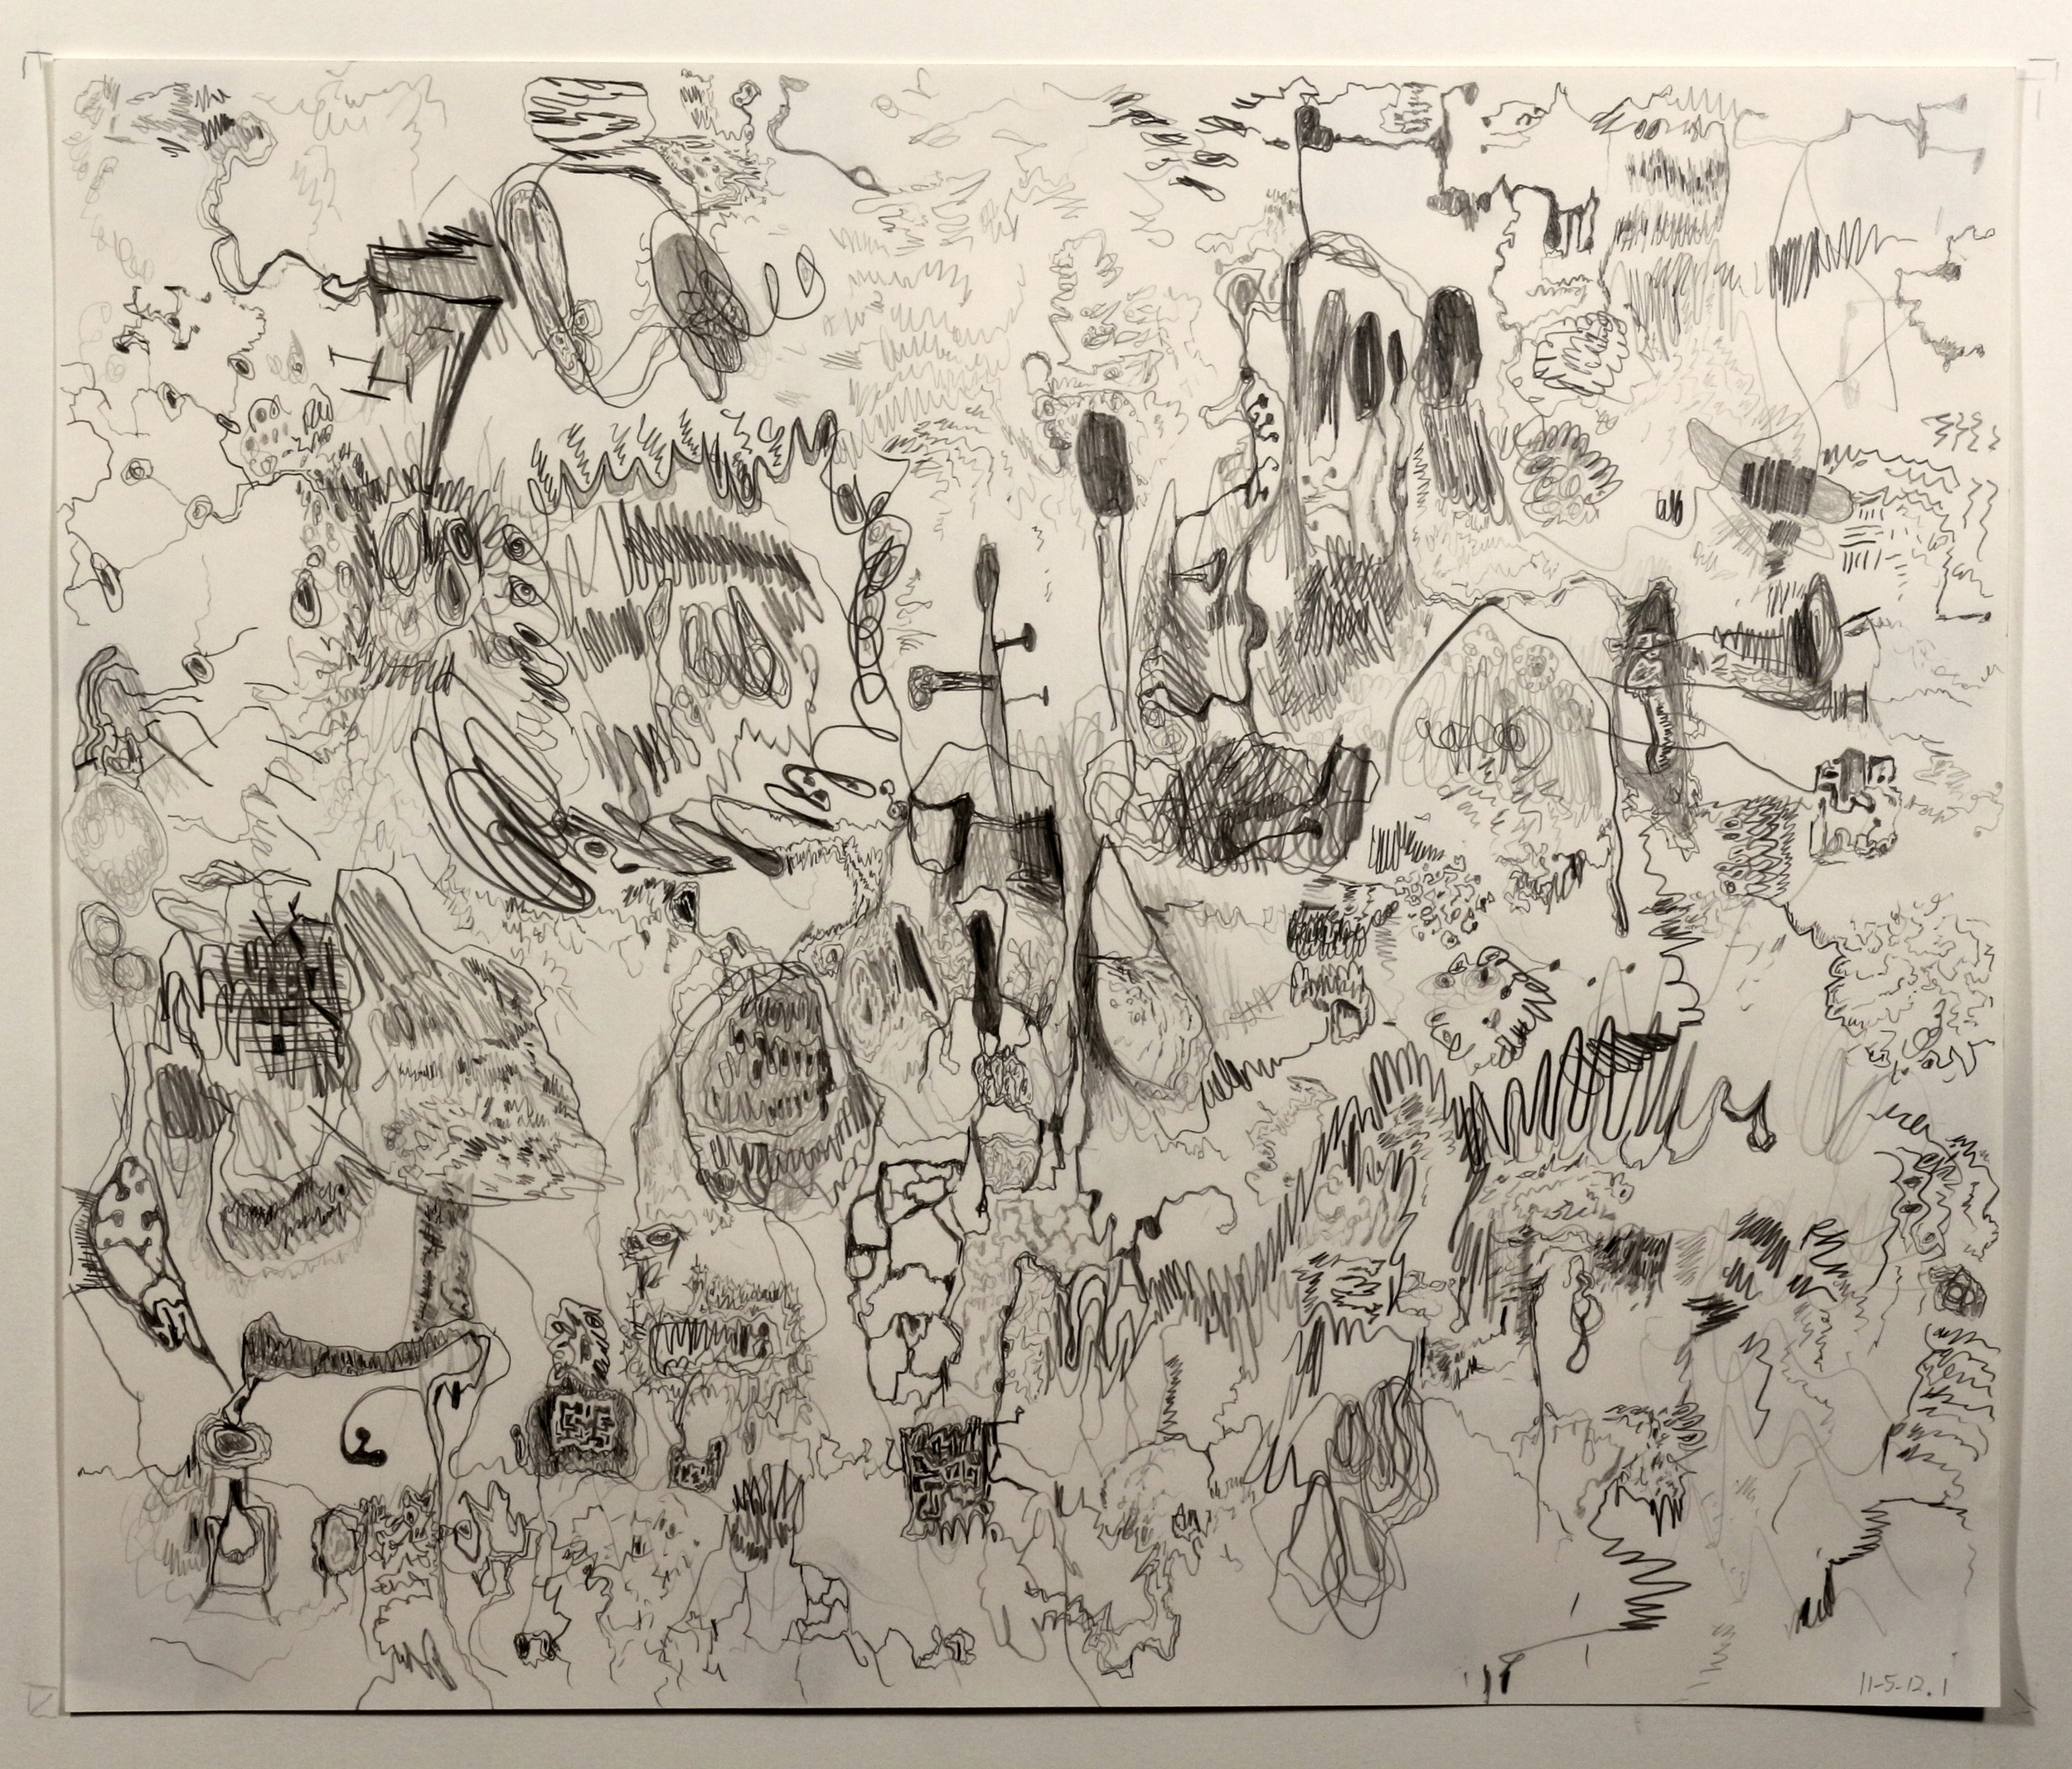 Untitled (11-4-2012.1)